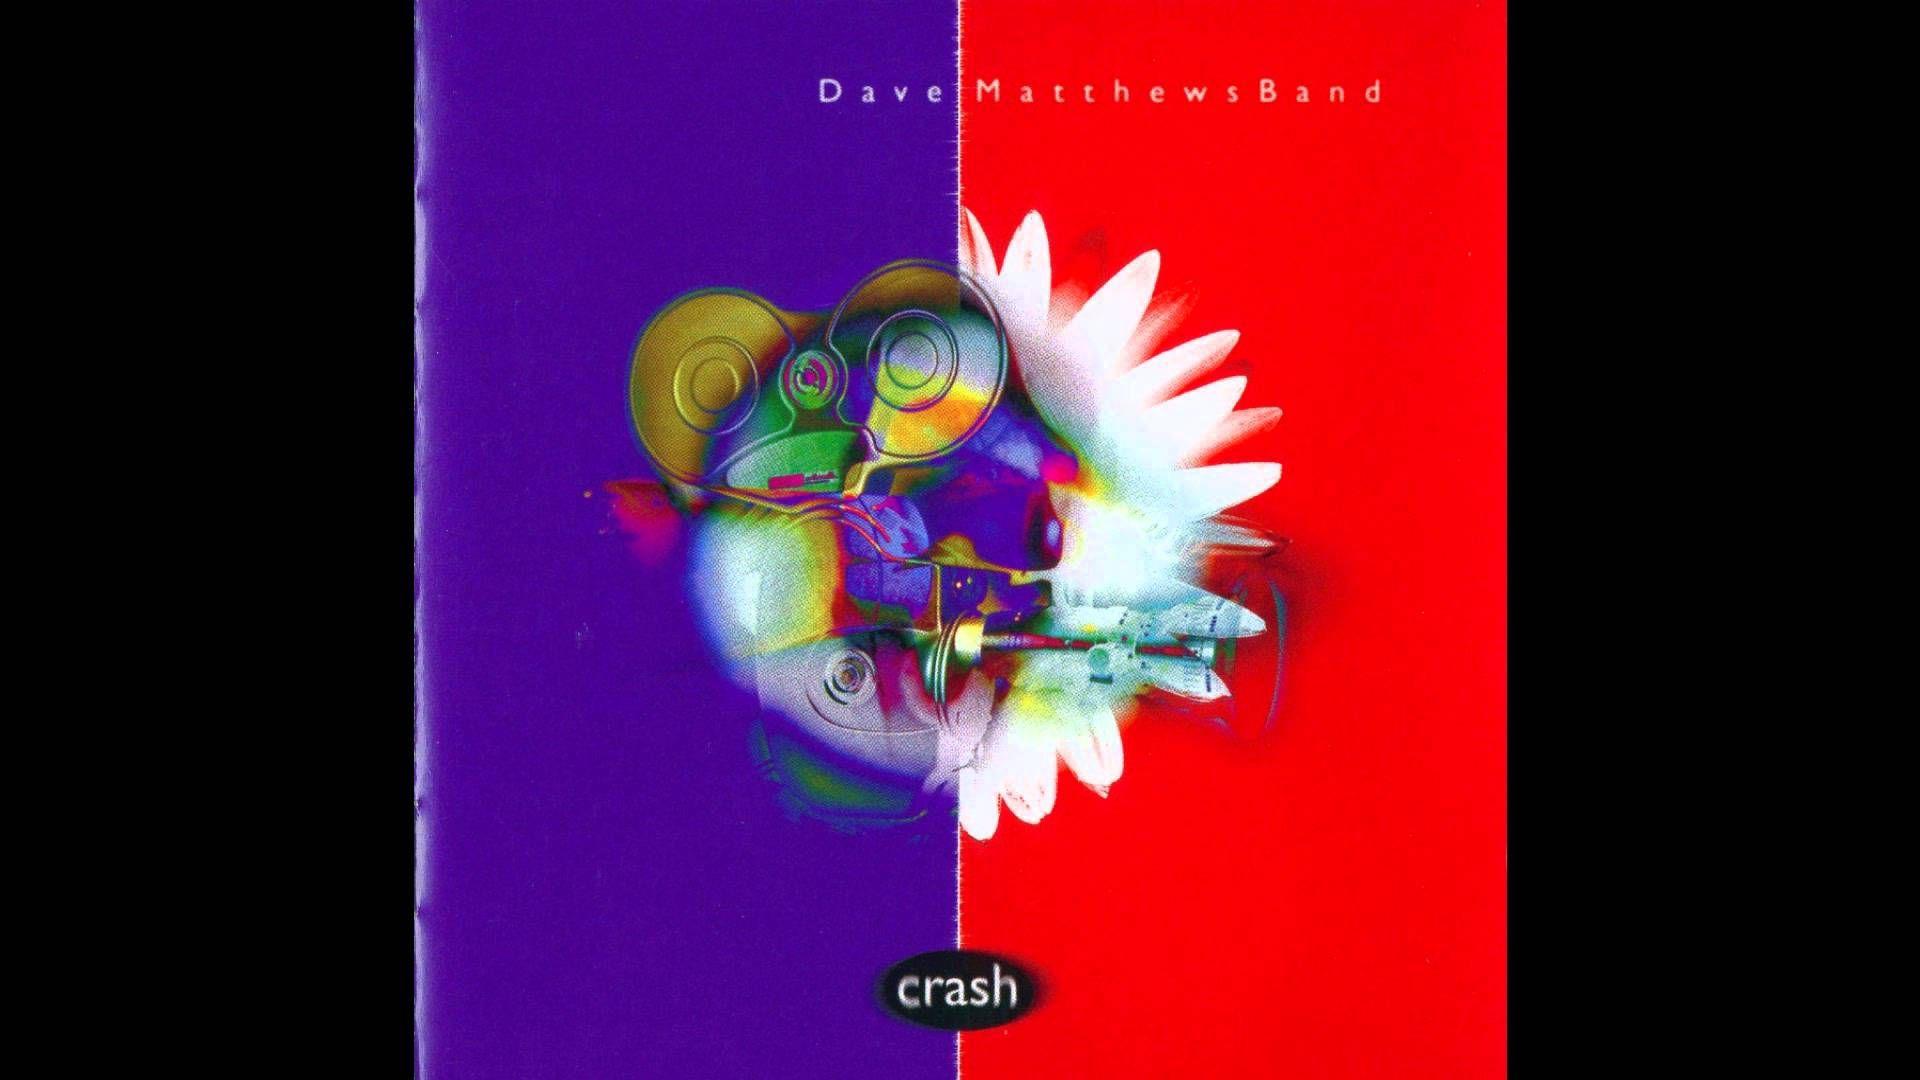 Lie in Our Graves Dave Matthews Band Dave matthews